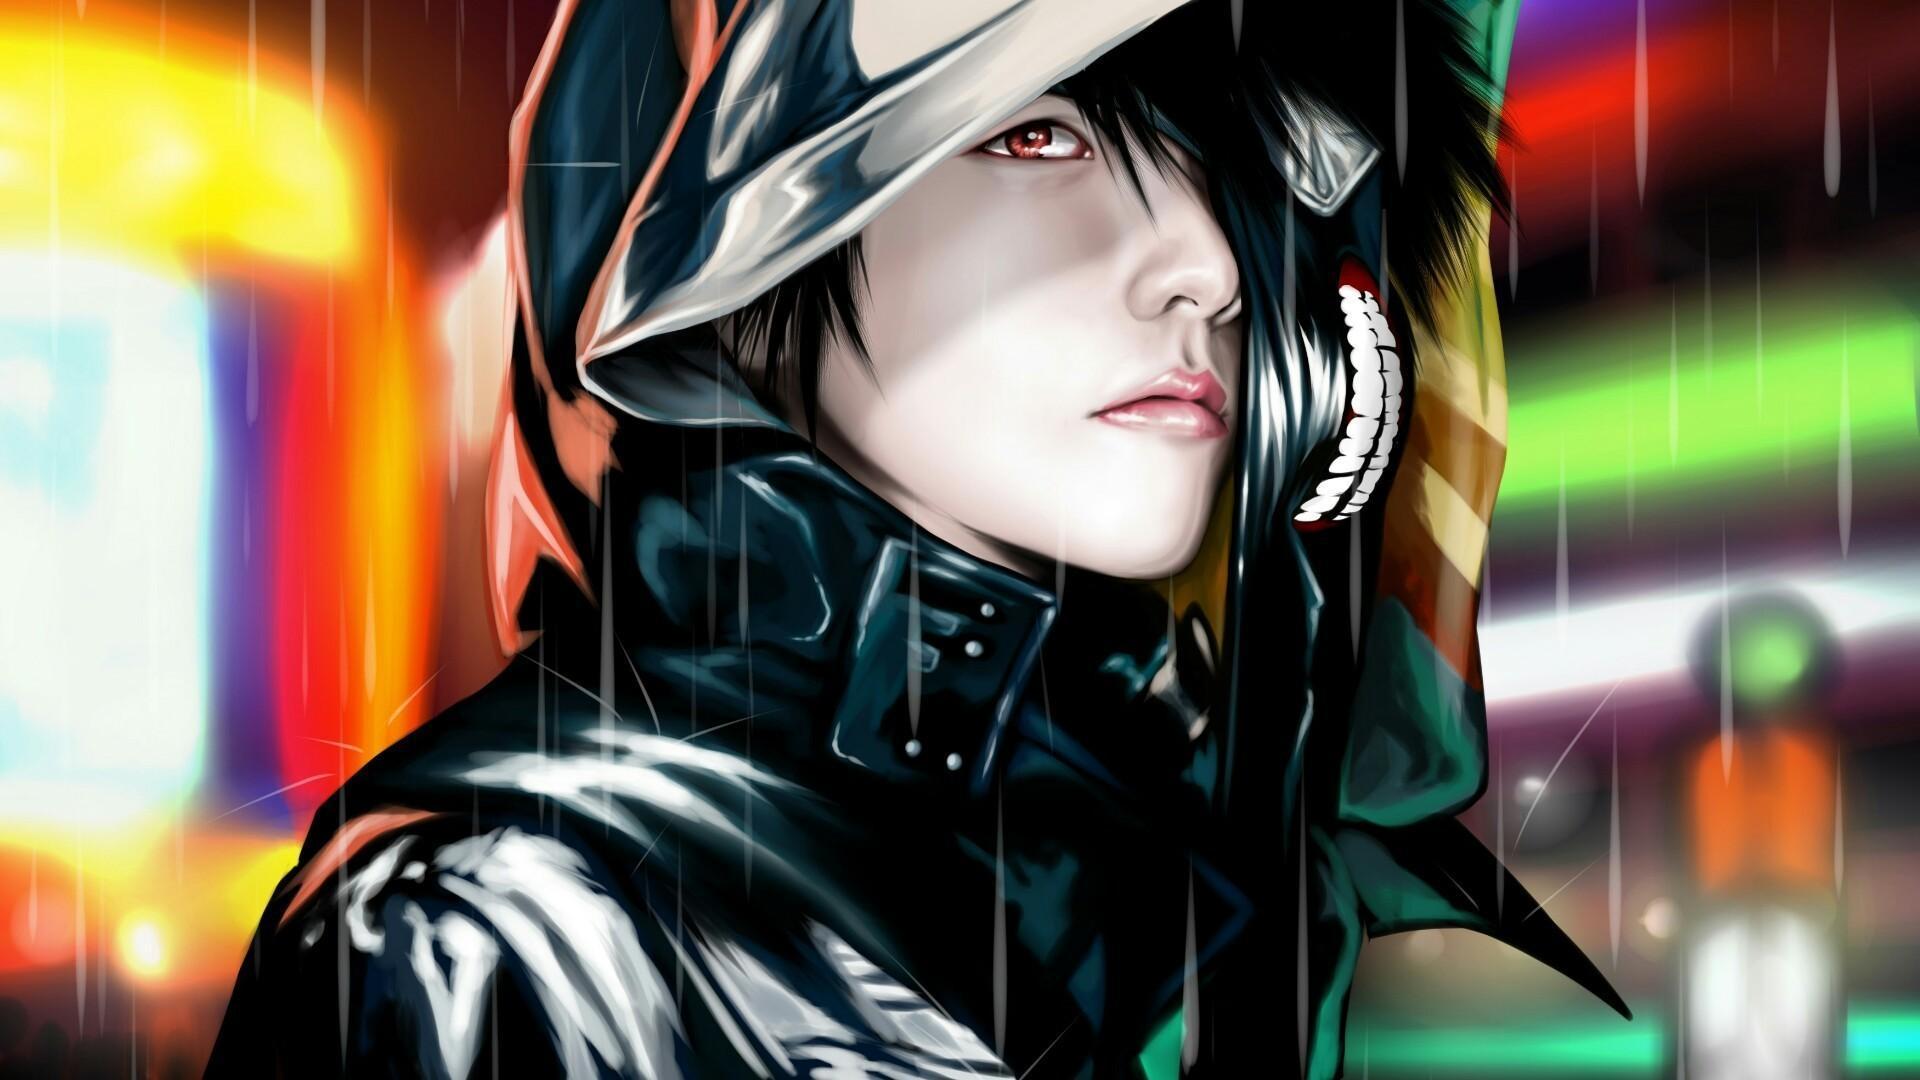 Wallpaper Background 3d Anime gambar ke 6